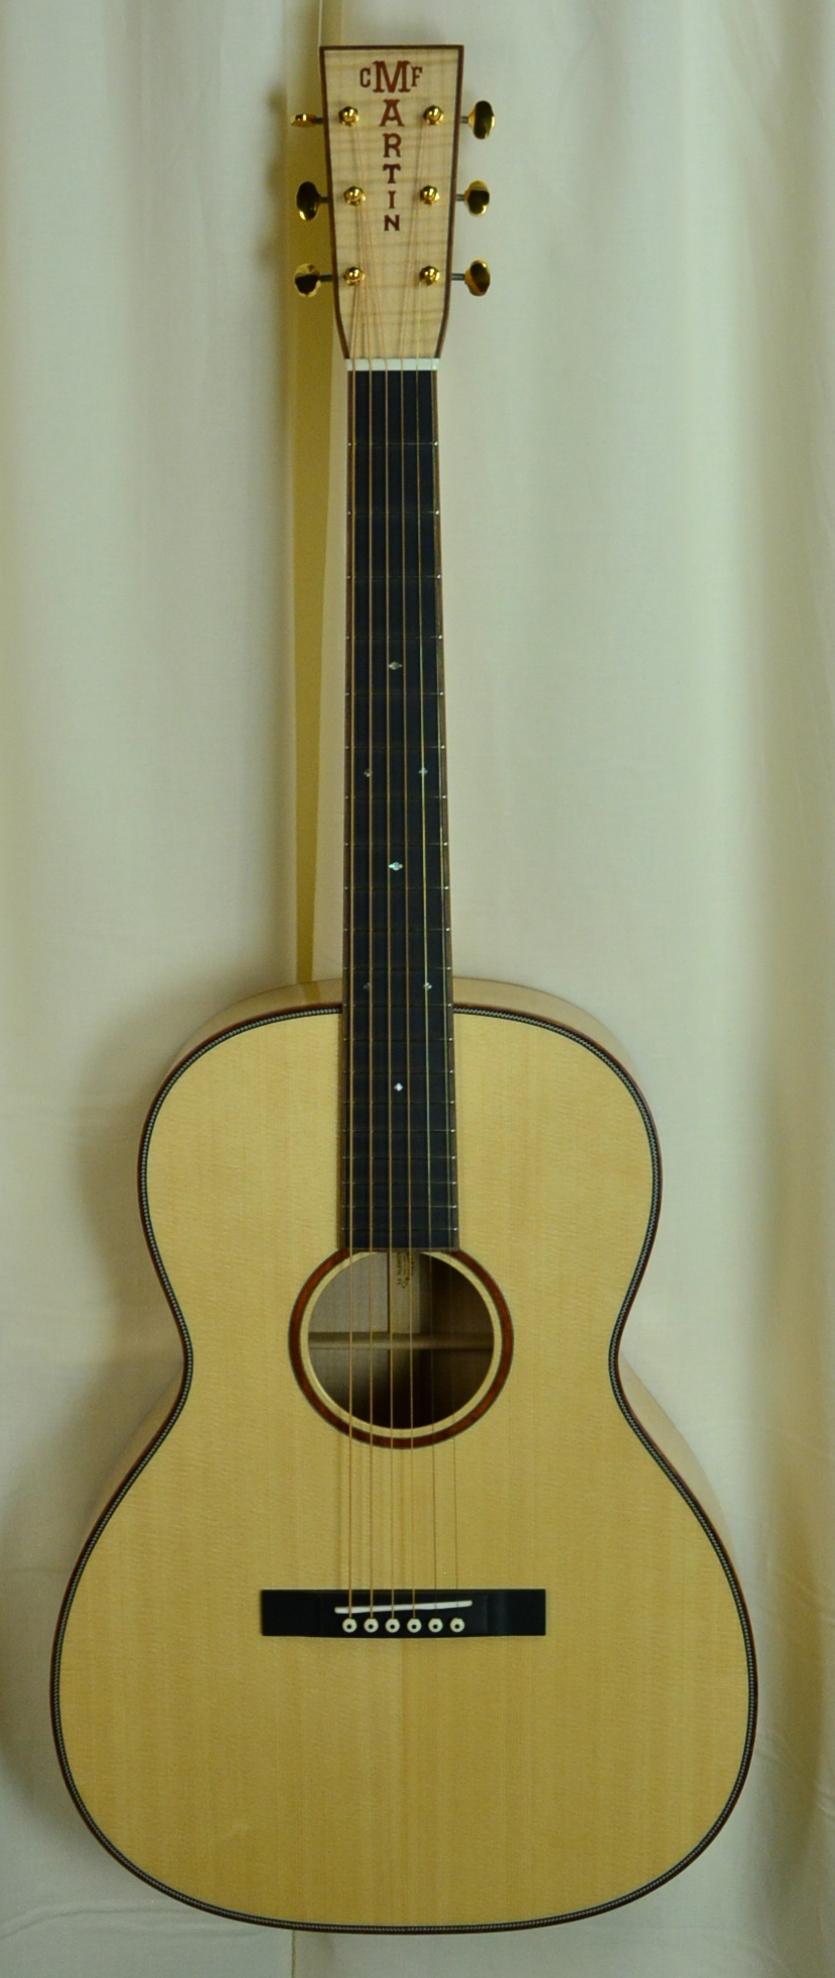 Q-2658124 S-1938295 00028VS Pacific Big Leaf Maple AAAA, Maple neck Bubinga binding (1).JPG